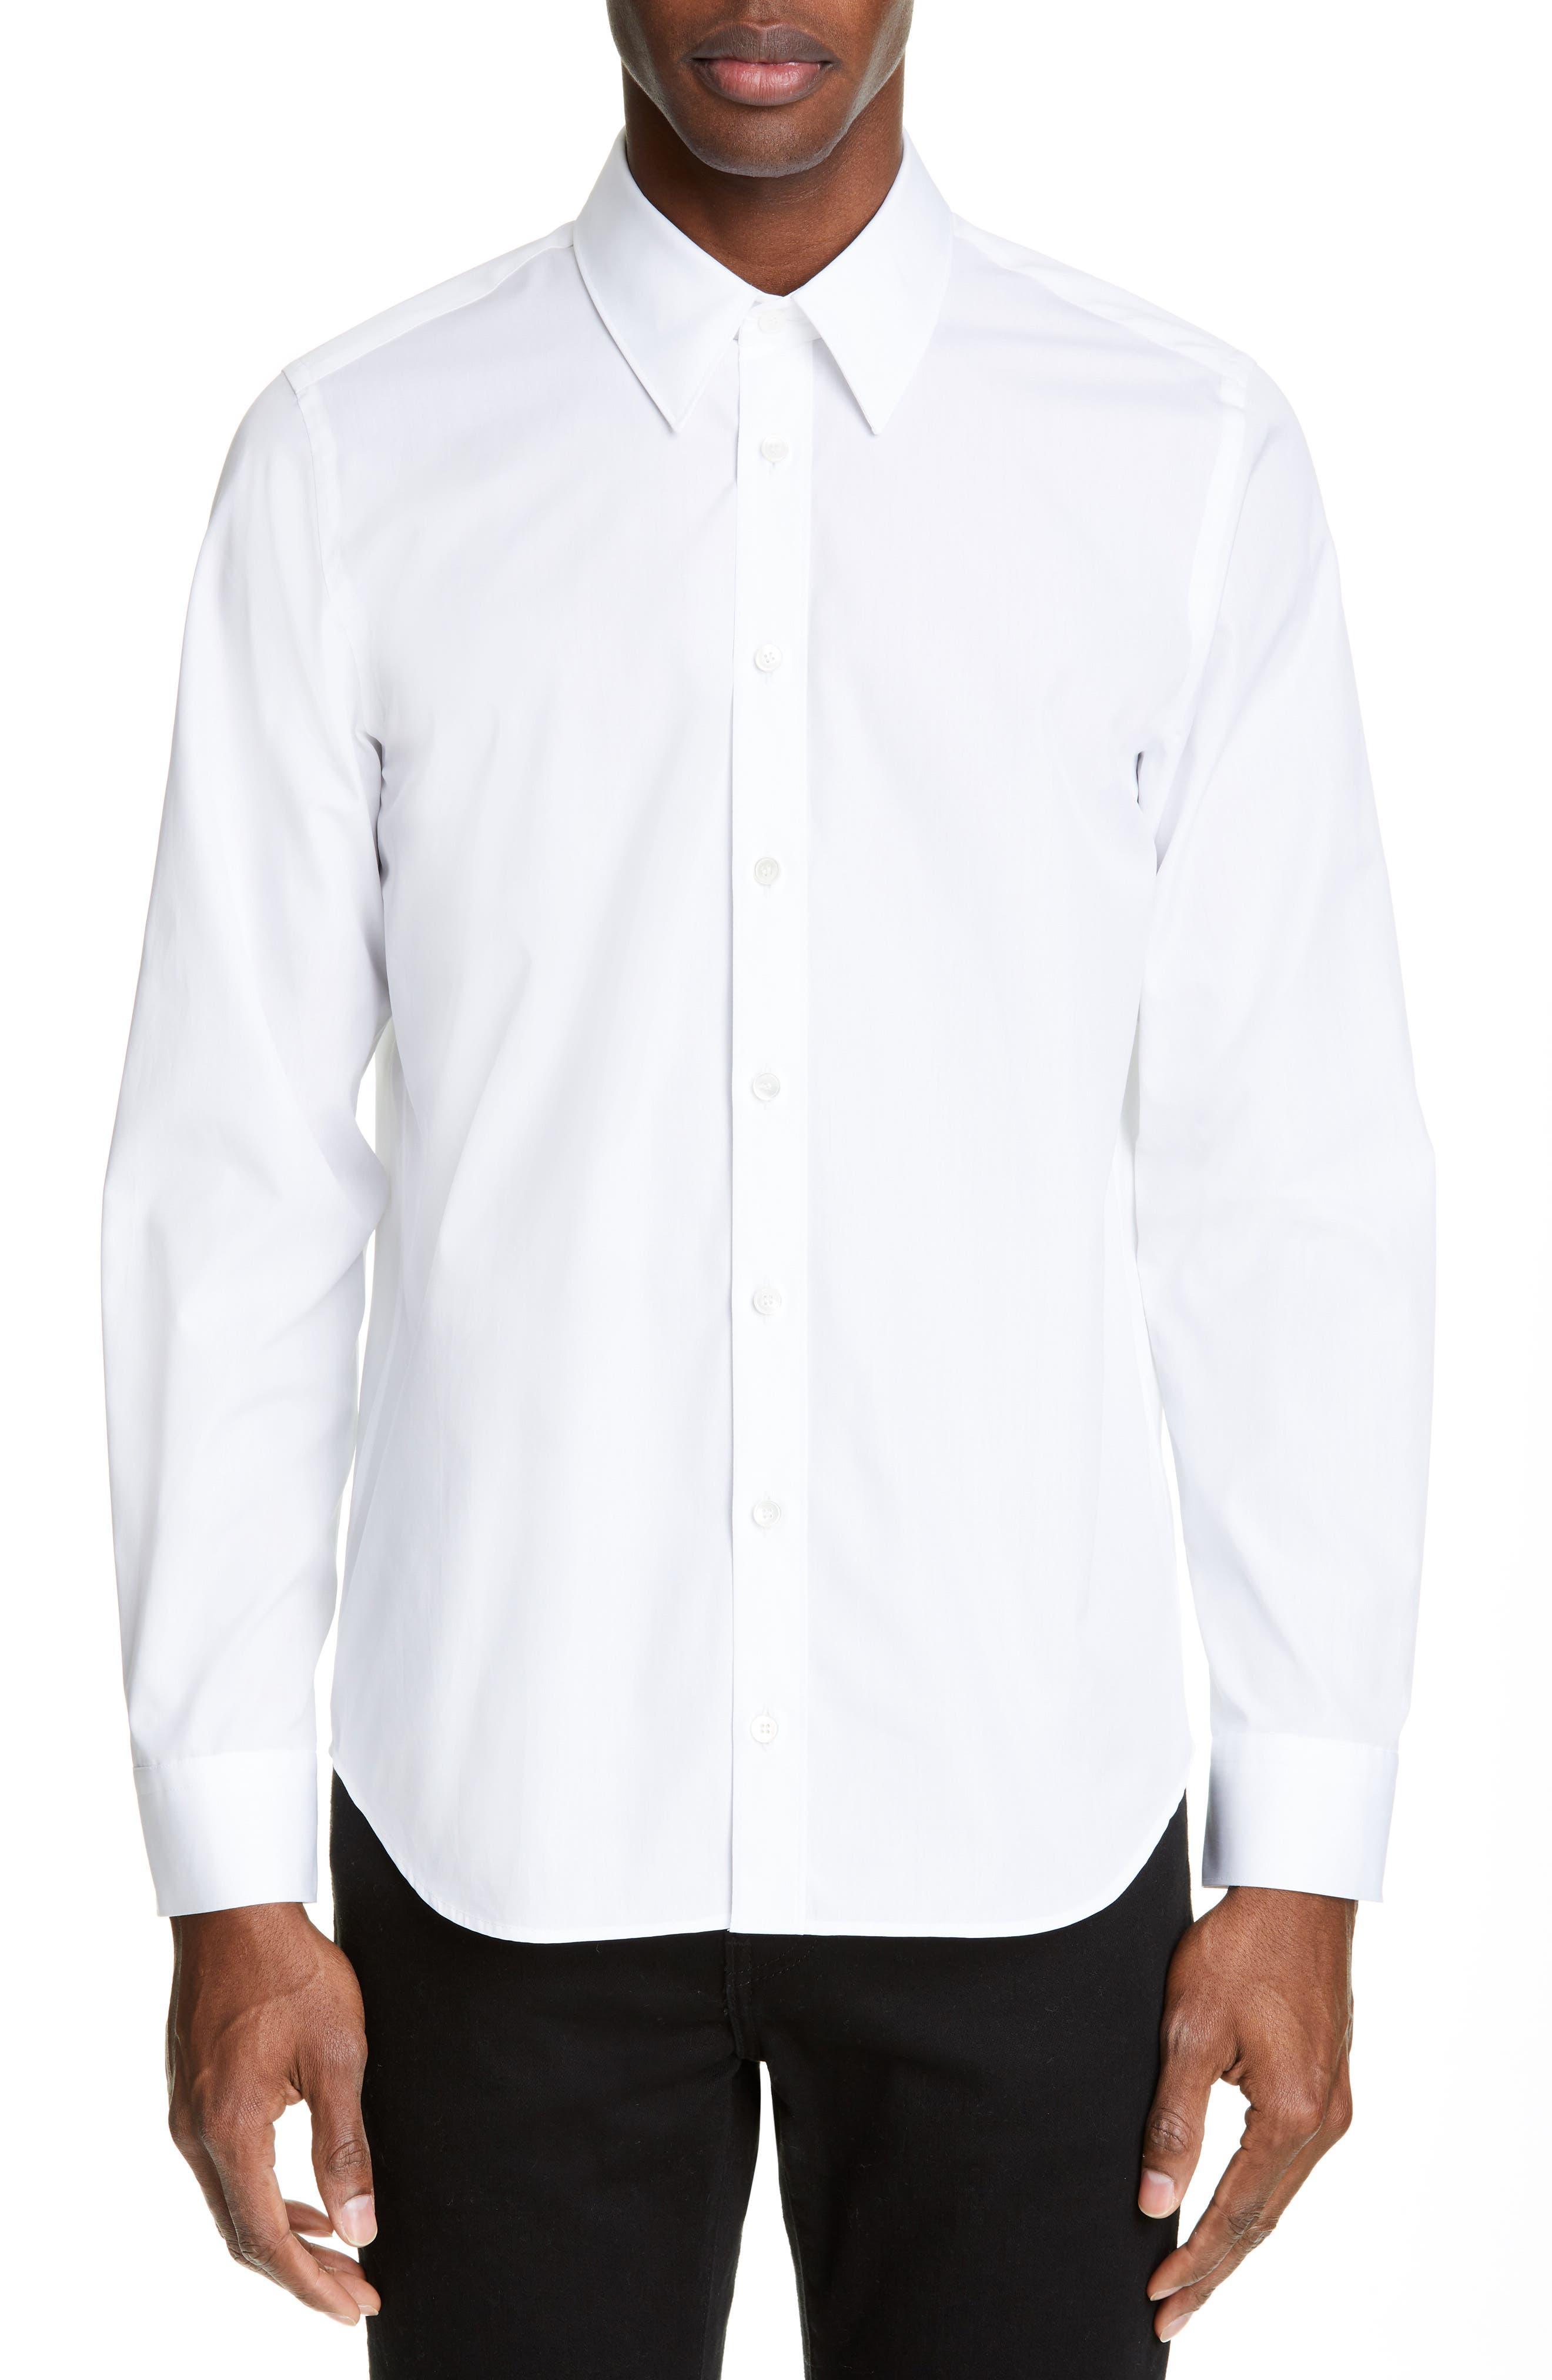 Logo Print Slim Fit Shirt, Main, color, WHITE/SILVER